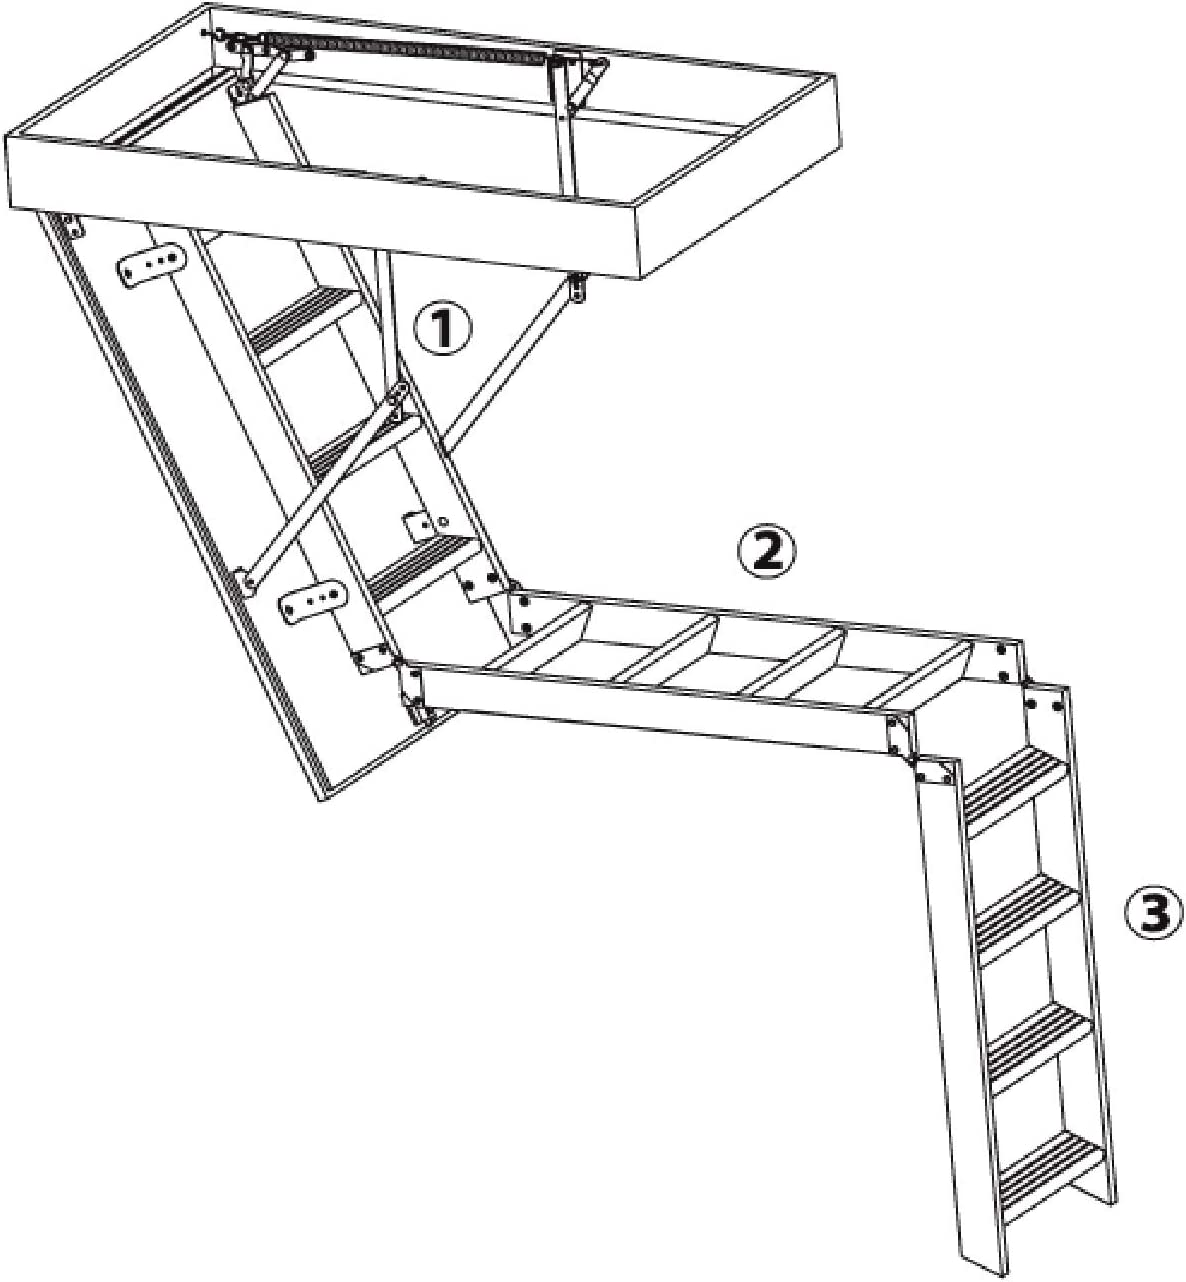 Bodentreppe PS Oman Thermo 120x55 Speichertreppe Treppe Handlauf